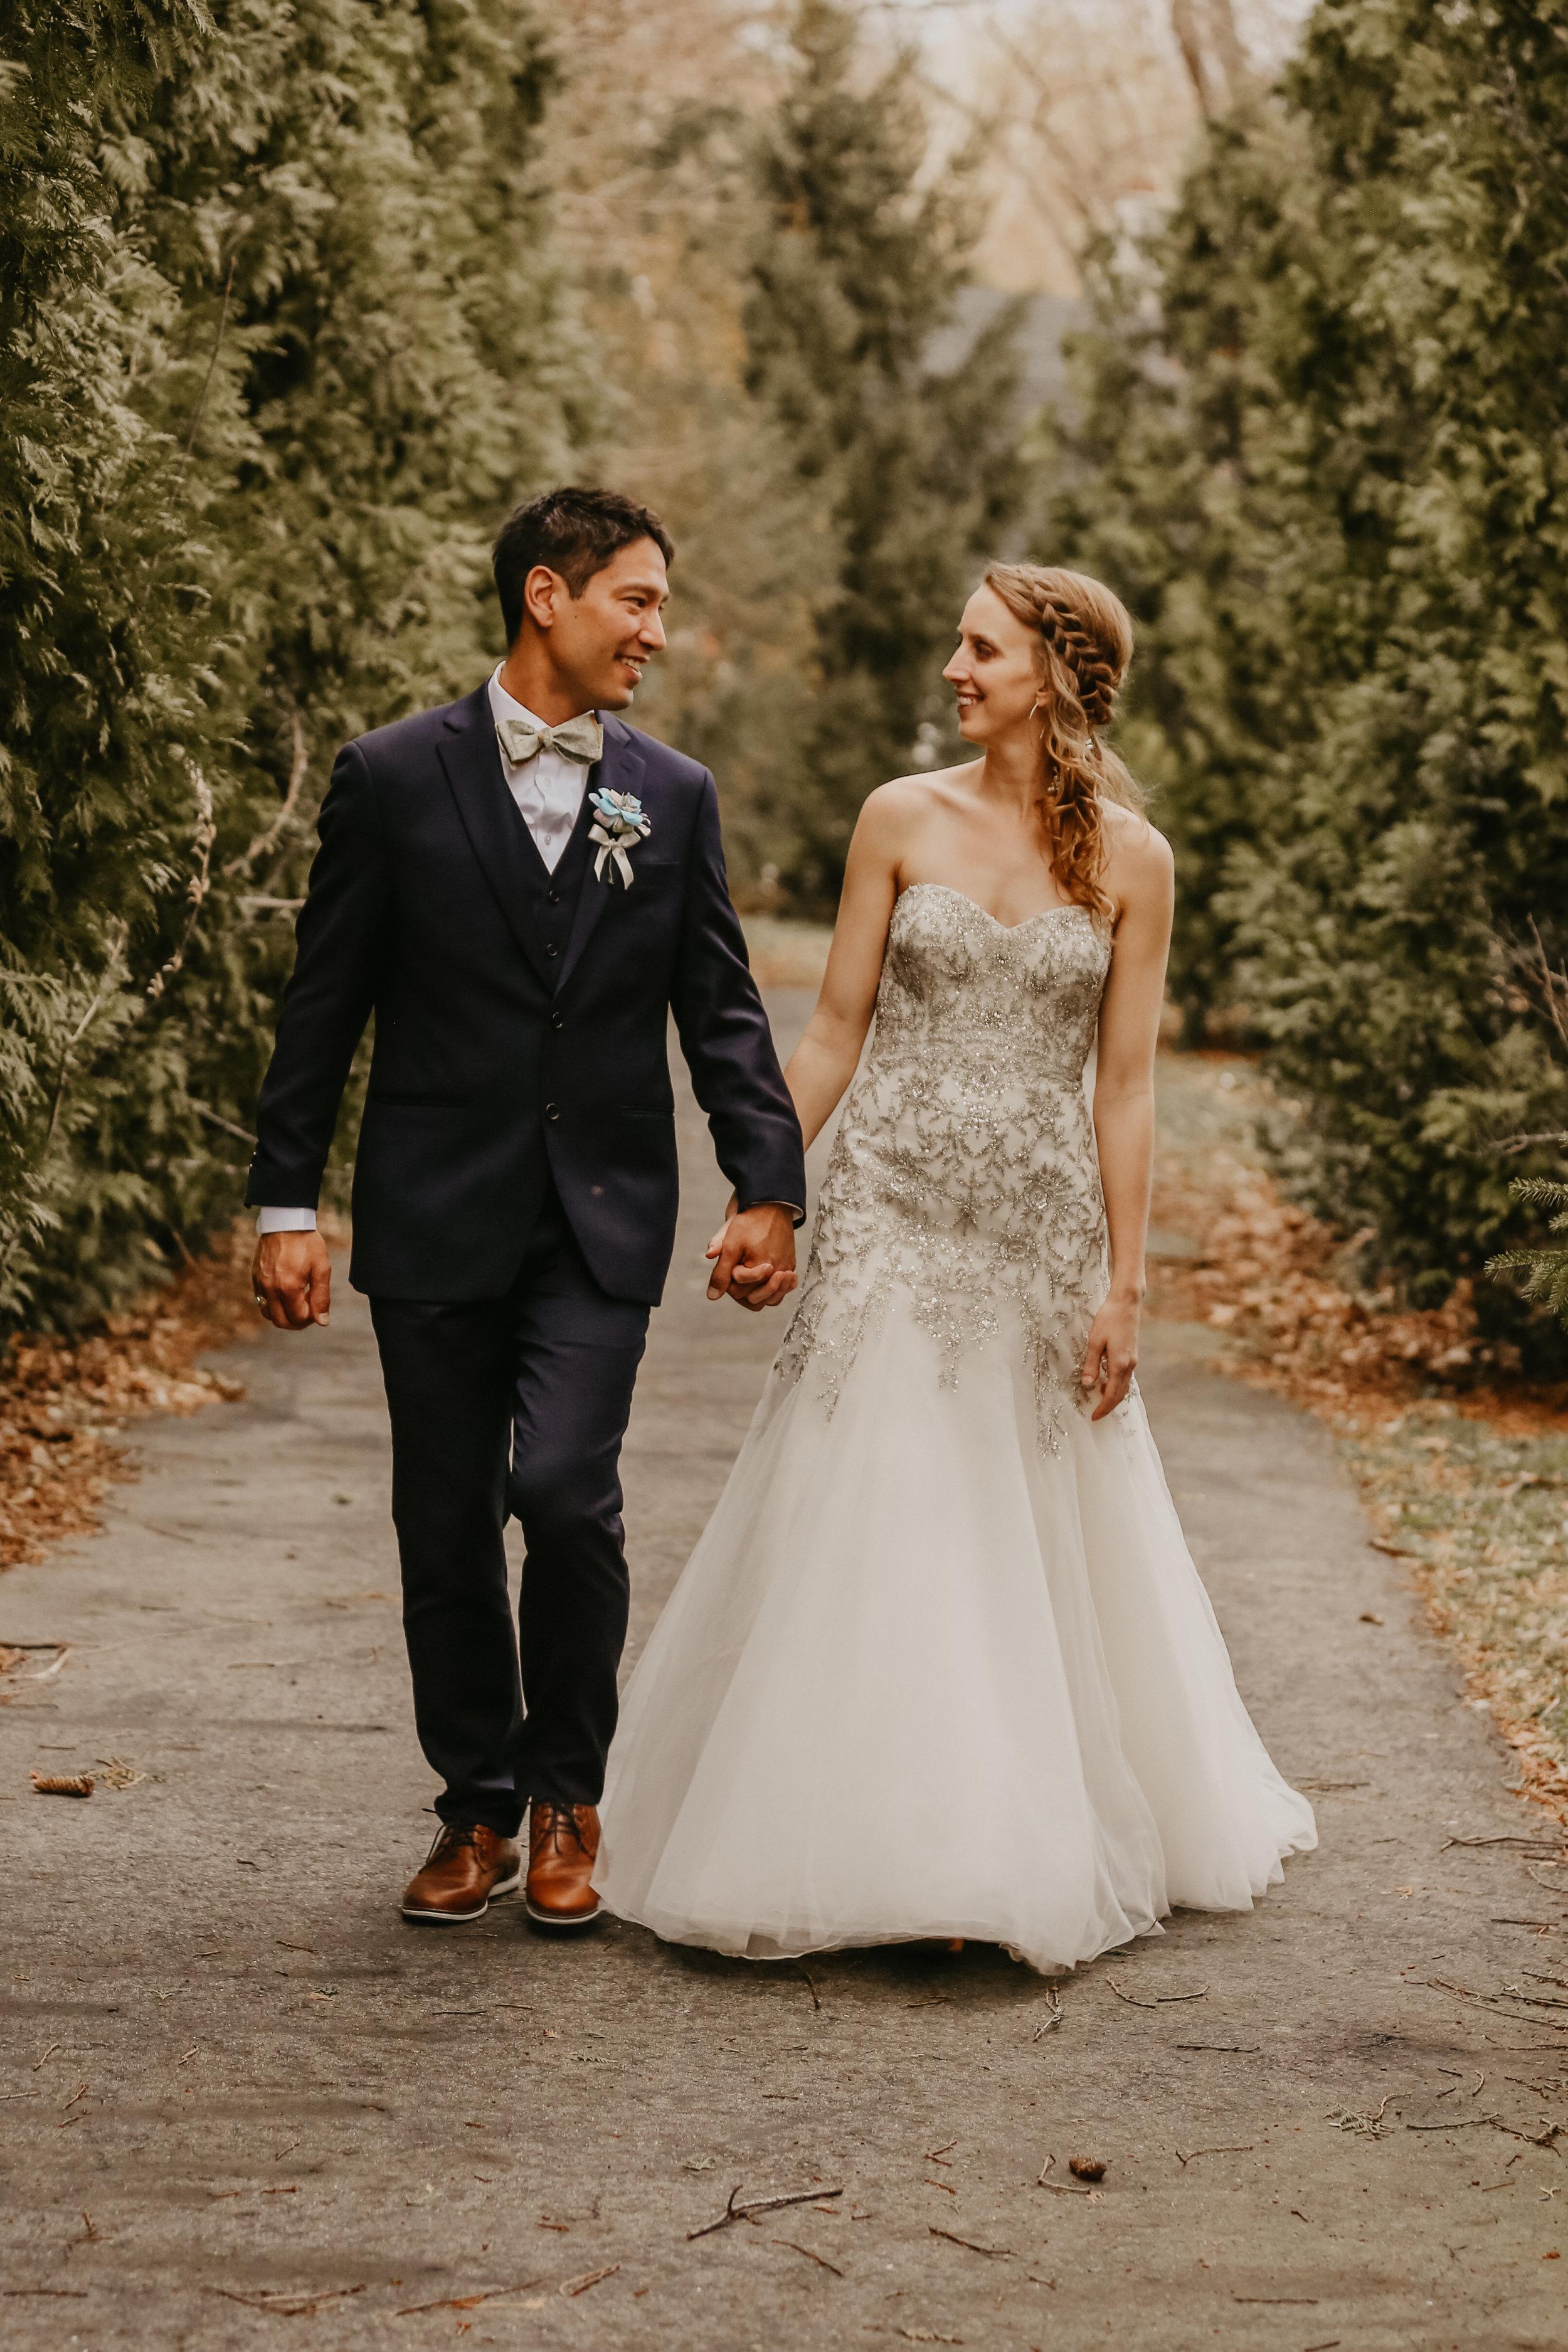 Britt-George-Wedding-Groveland-Fairways-Ruby-Jean-Photography-259.jpg